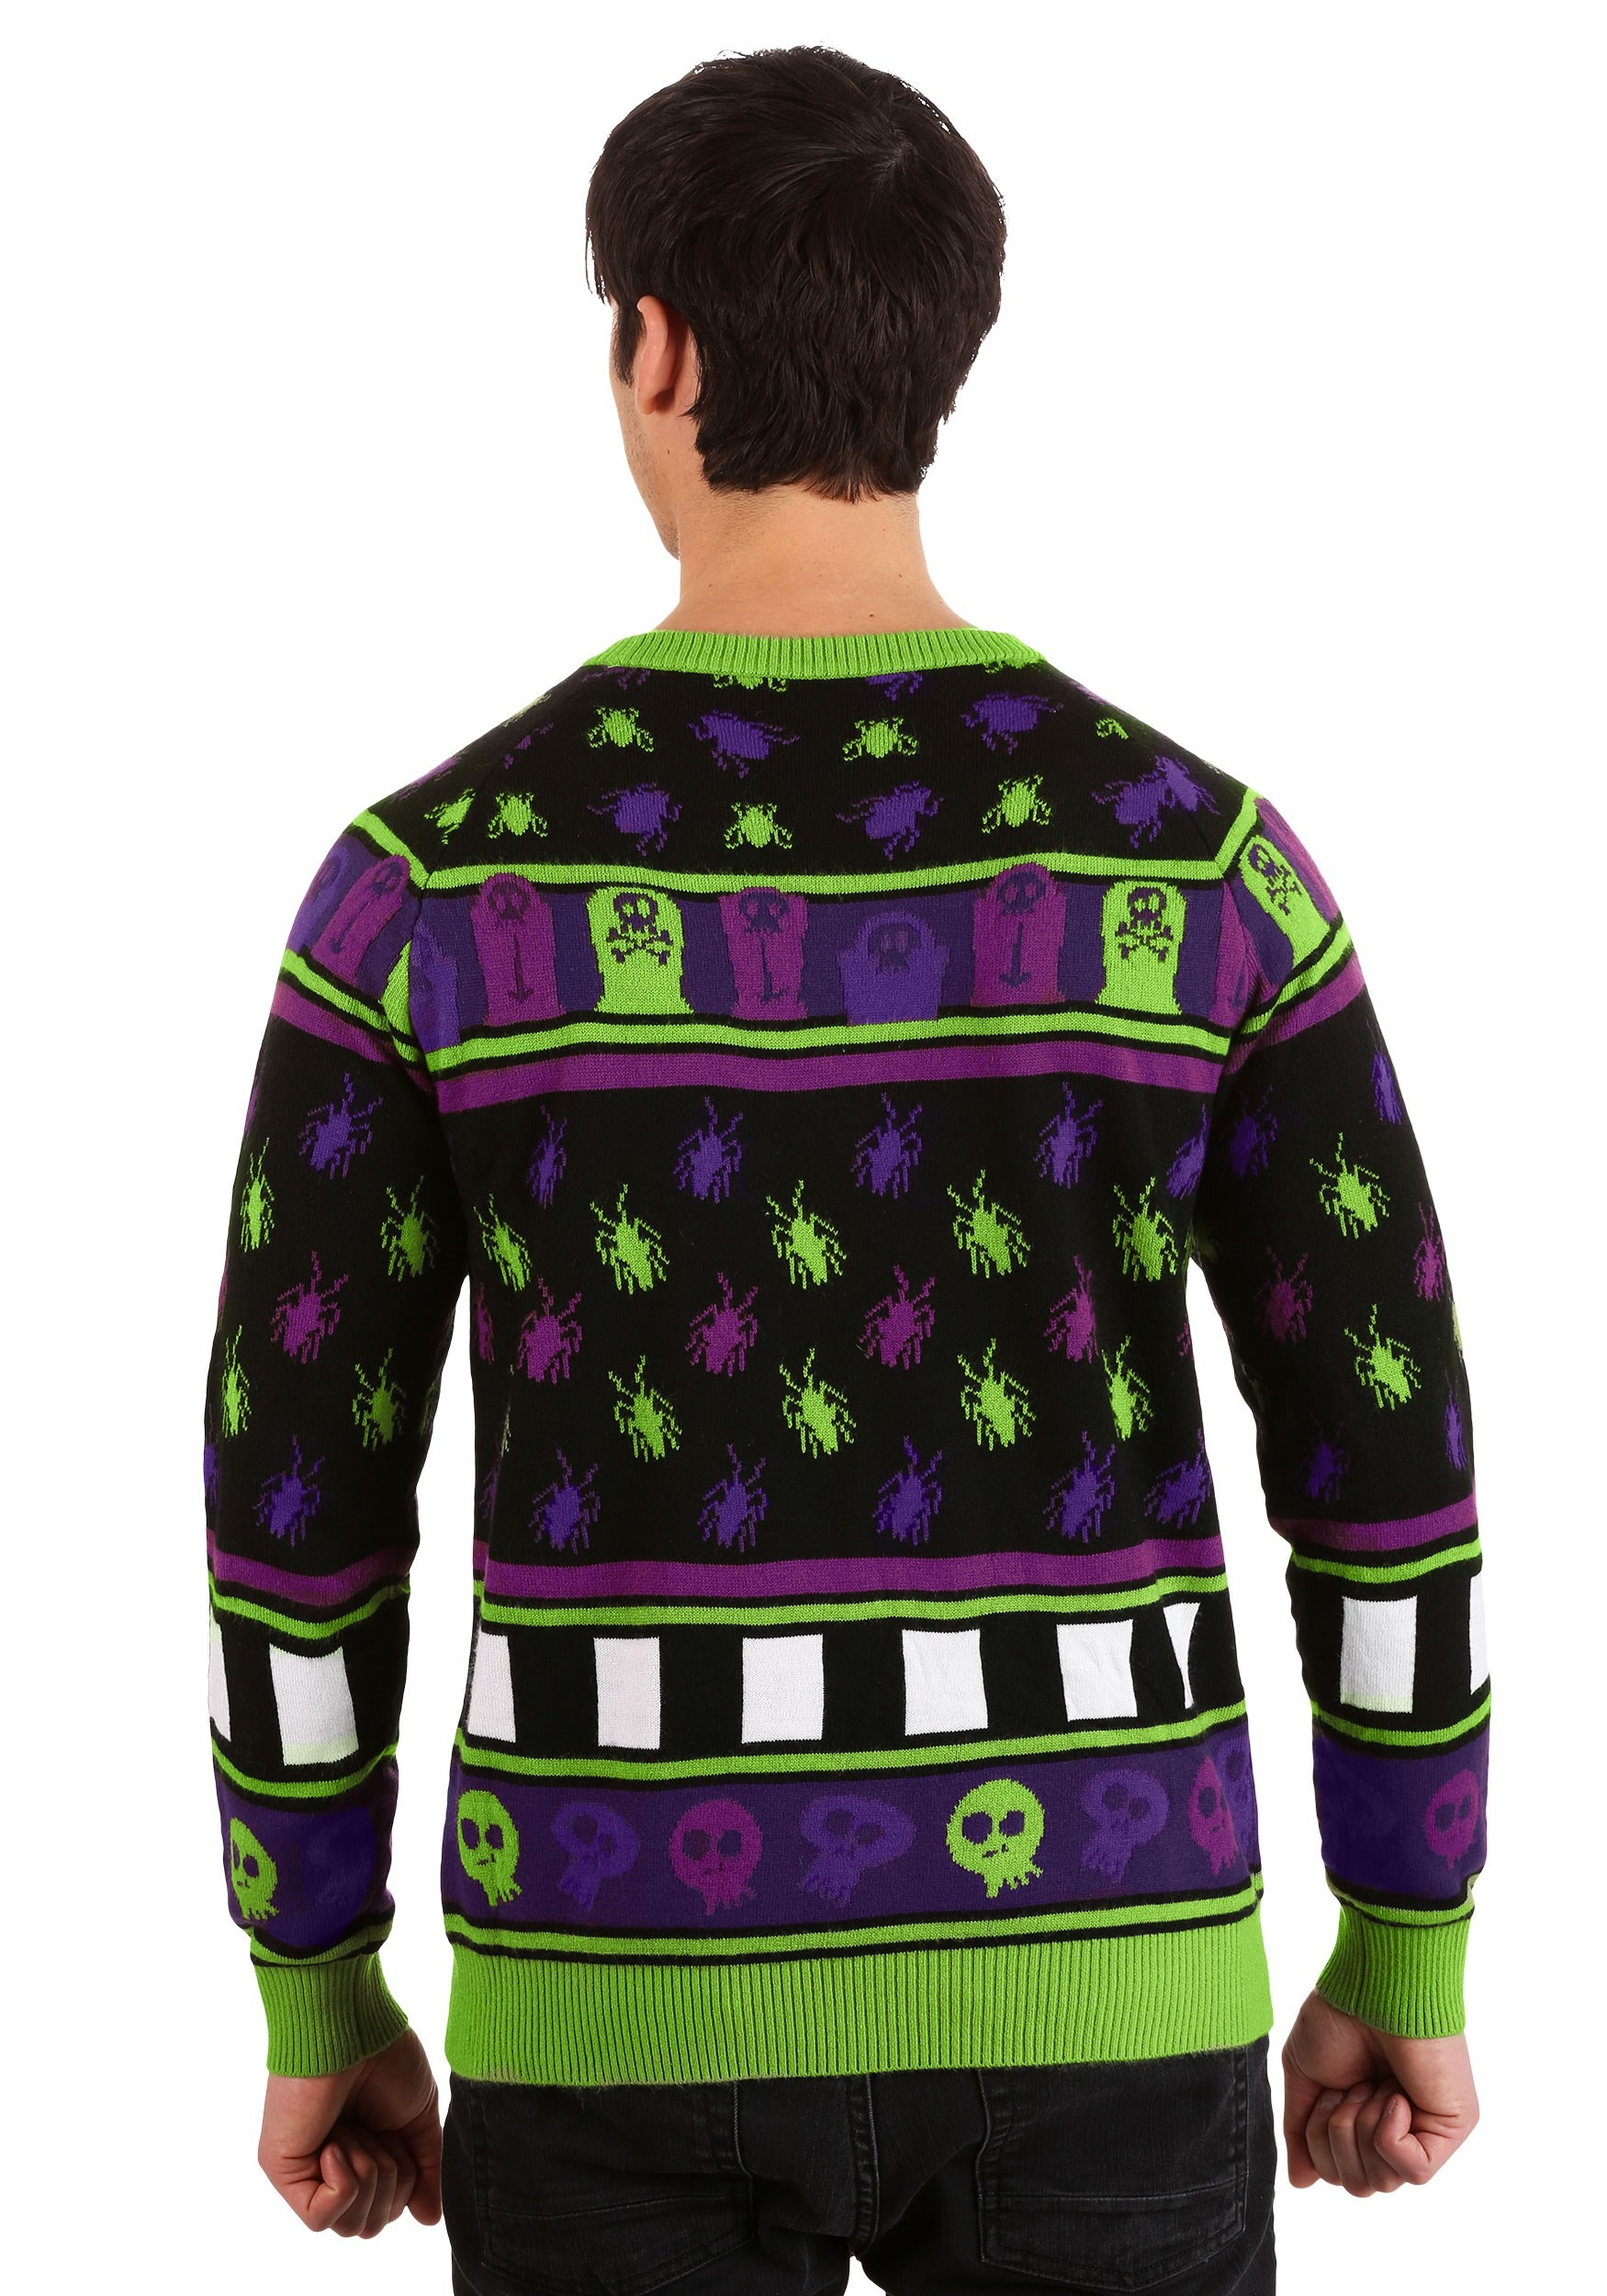 Beetlejuice It is Showtime Halloween Sweater